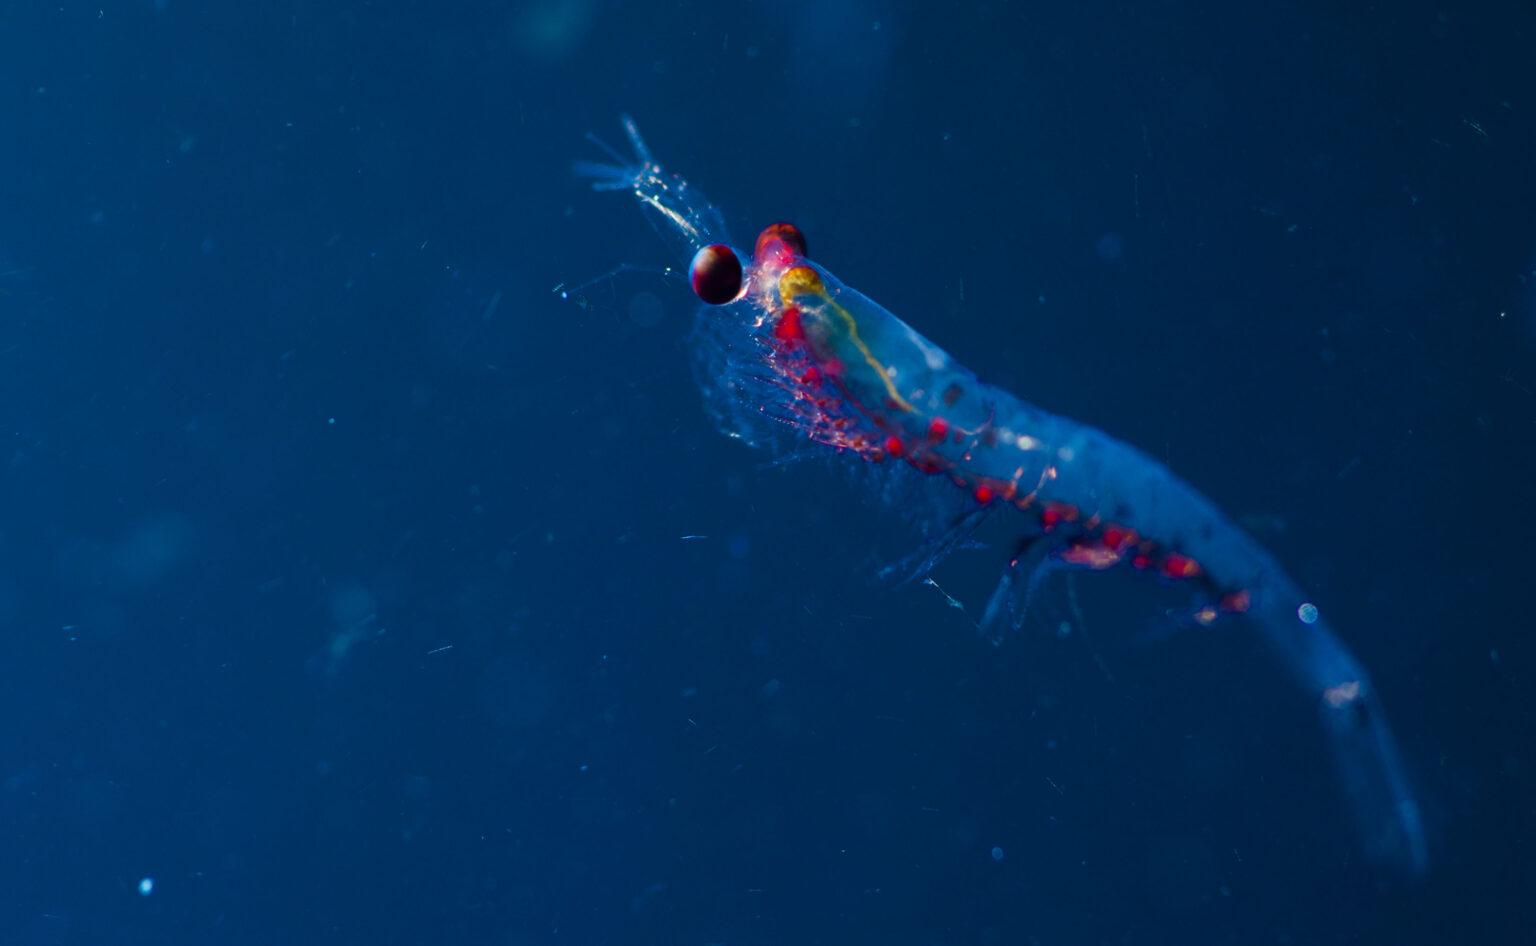 glowing blue shrimp-like organism